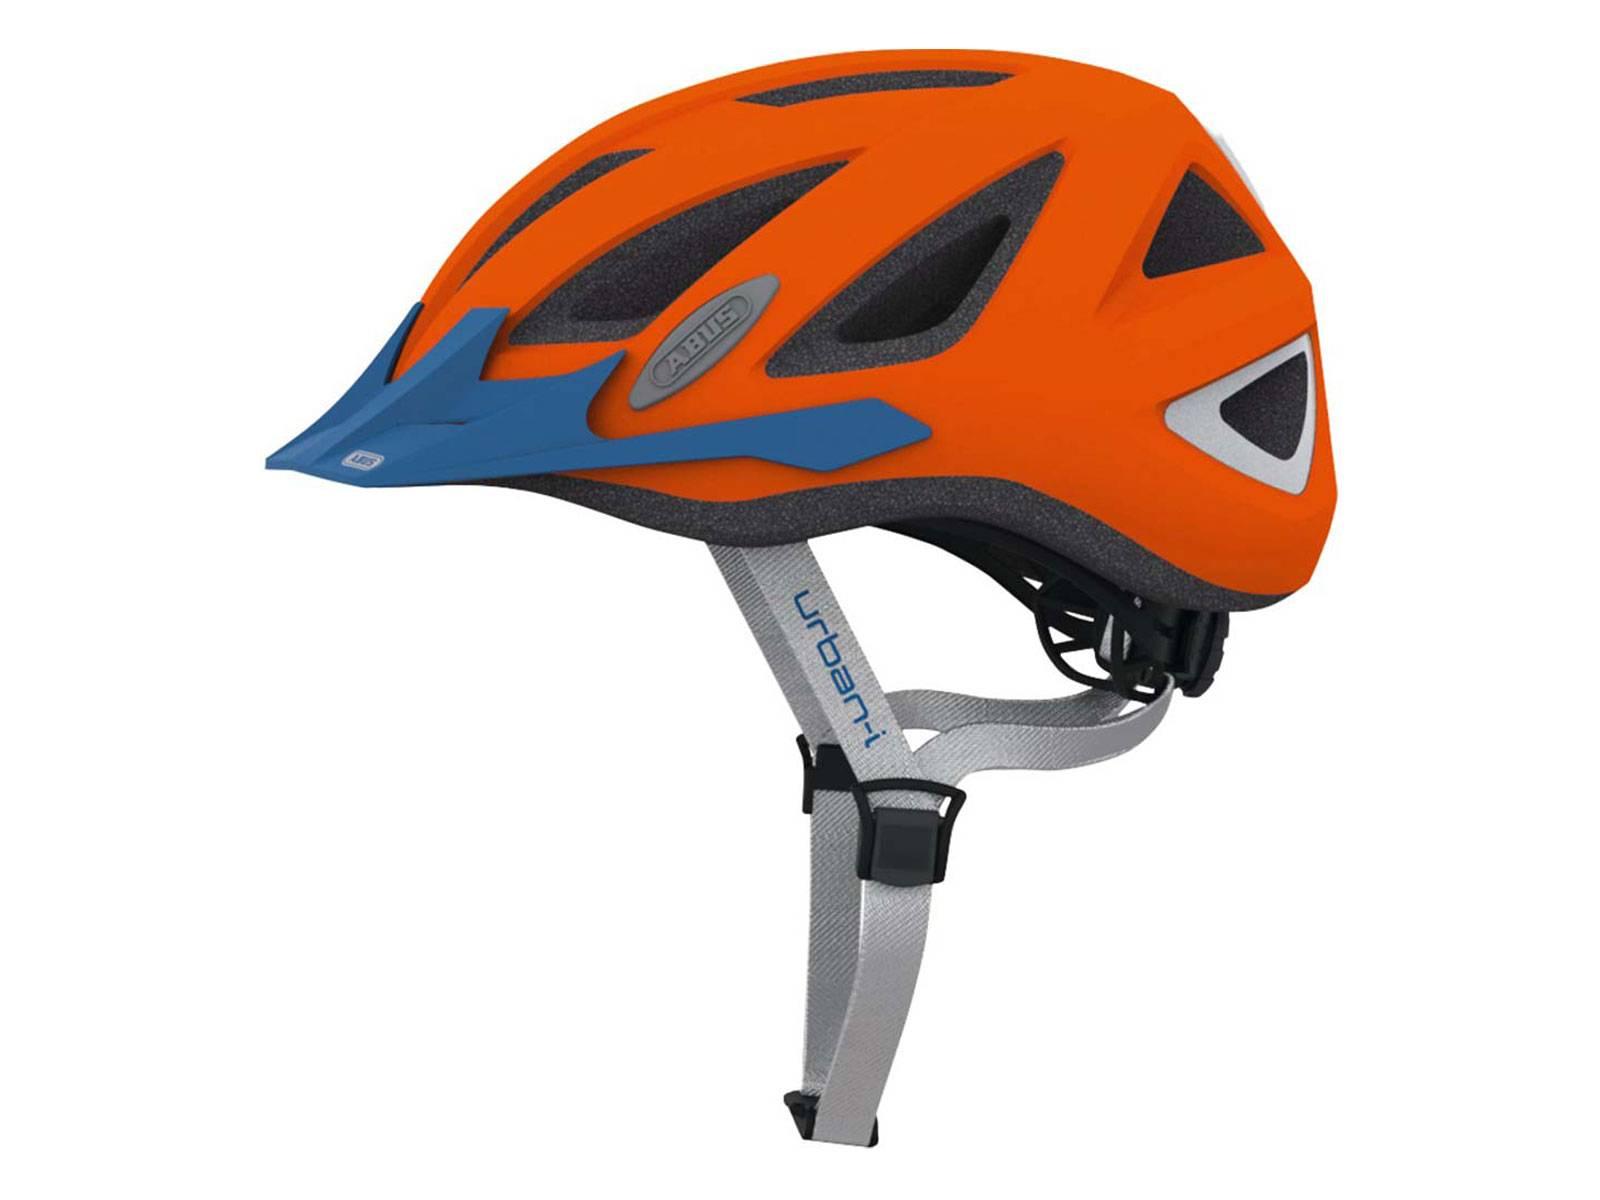 abus fahrradhelm urban i 2 0 l orange fahrradkomfort. Black Bedroom Furniture Sets. Home Design Ideas